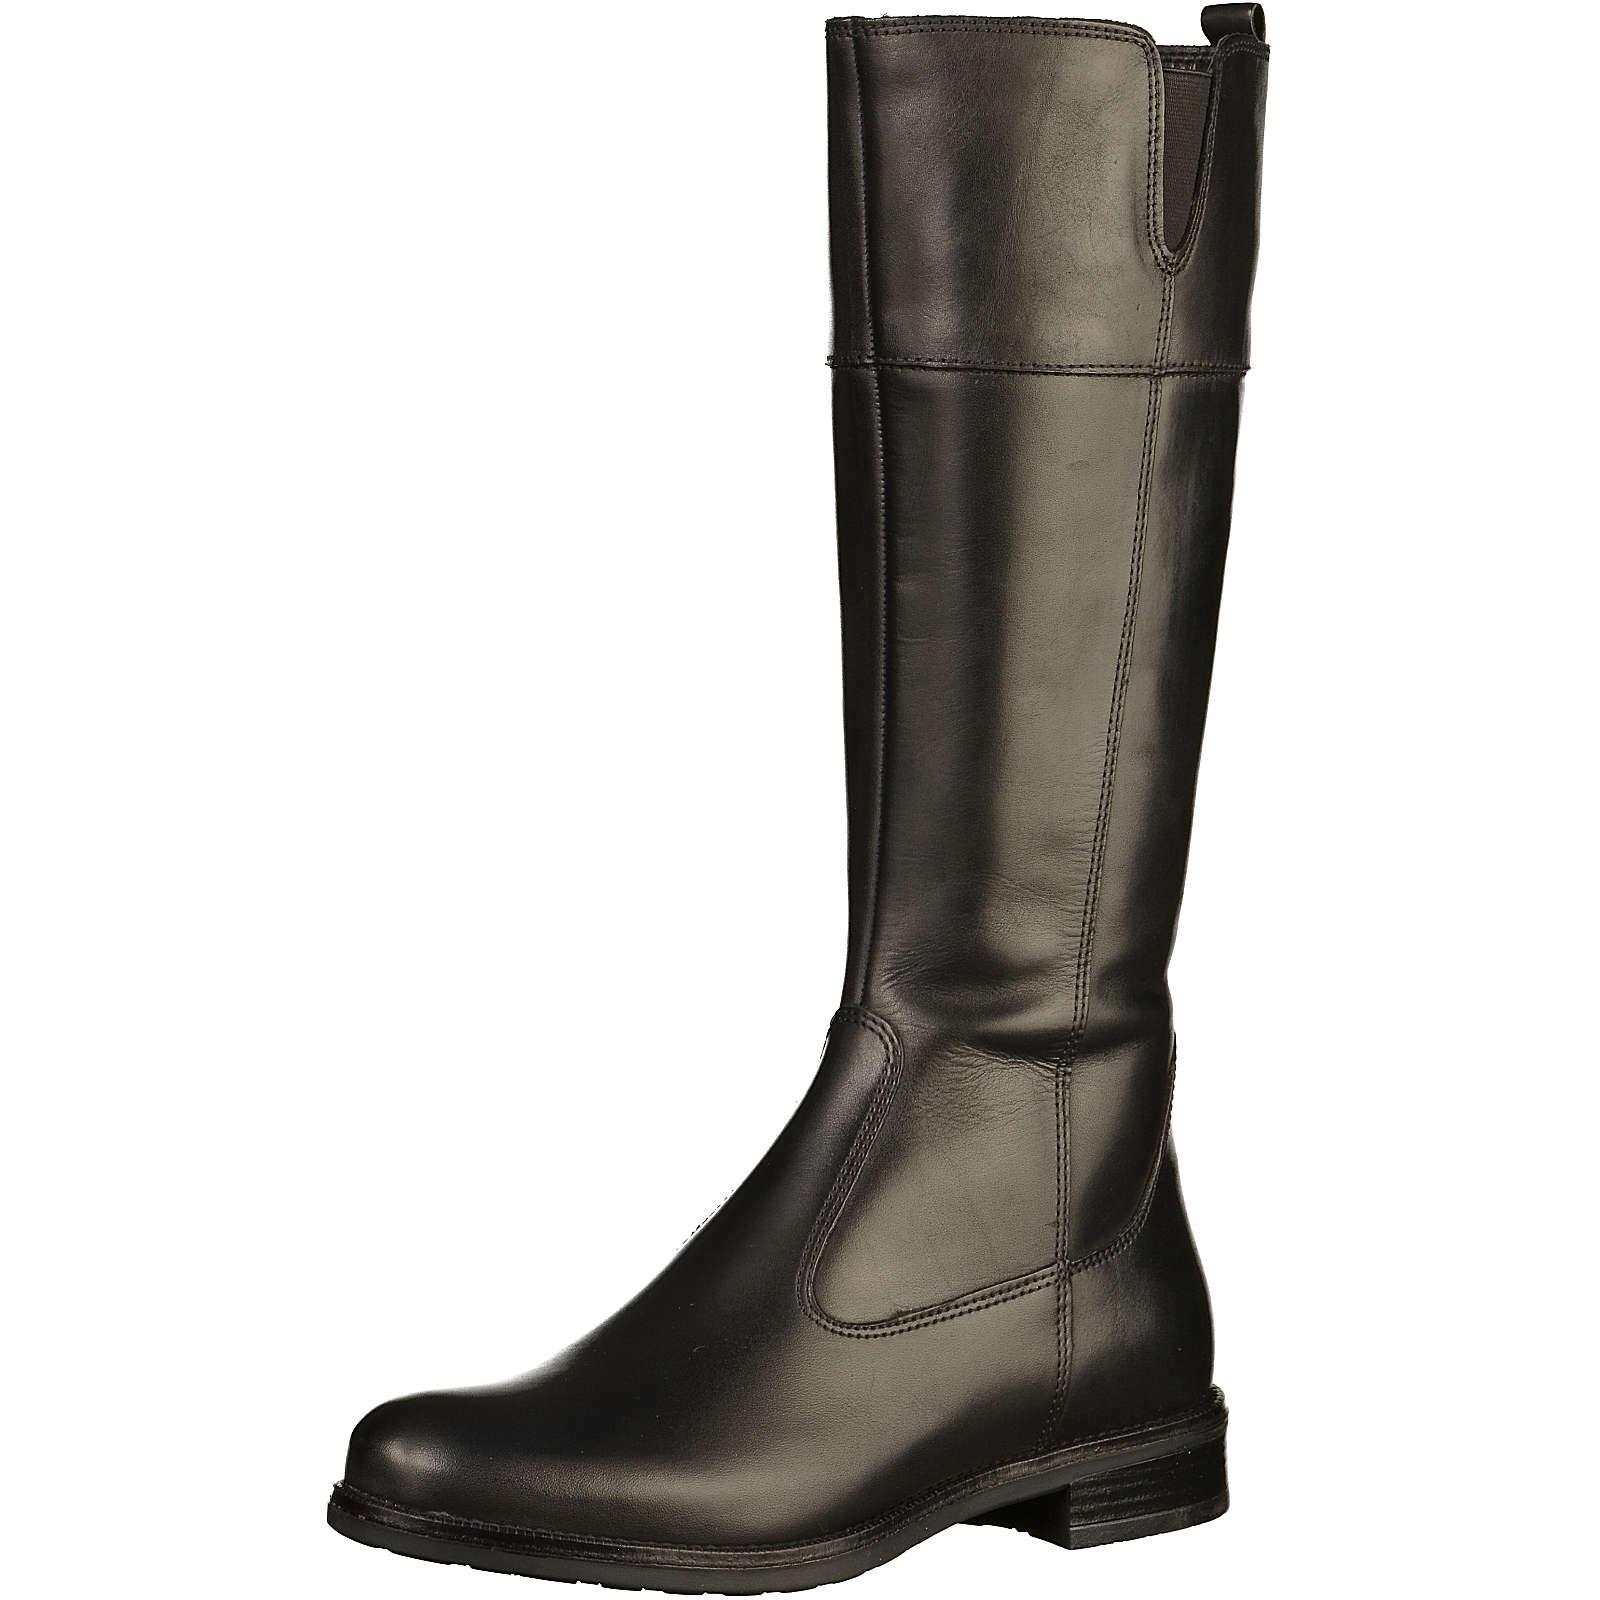 Tamaris Stiefel Klassische Stiefel schwarz Damen Gr. 42